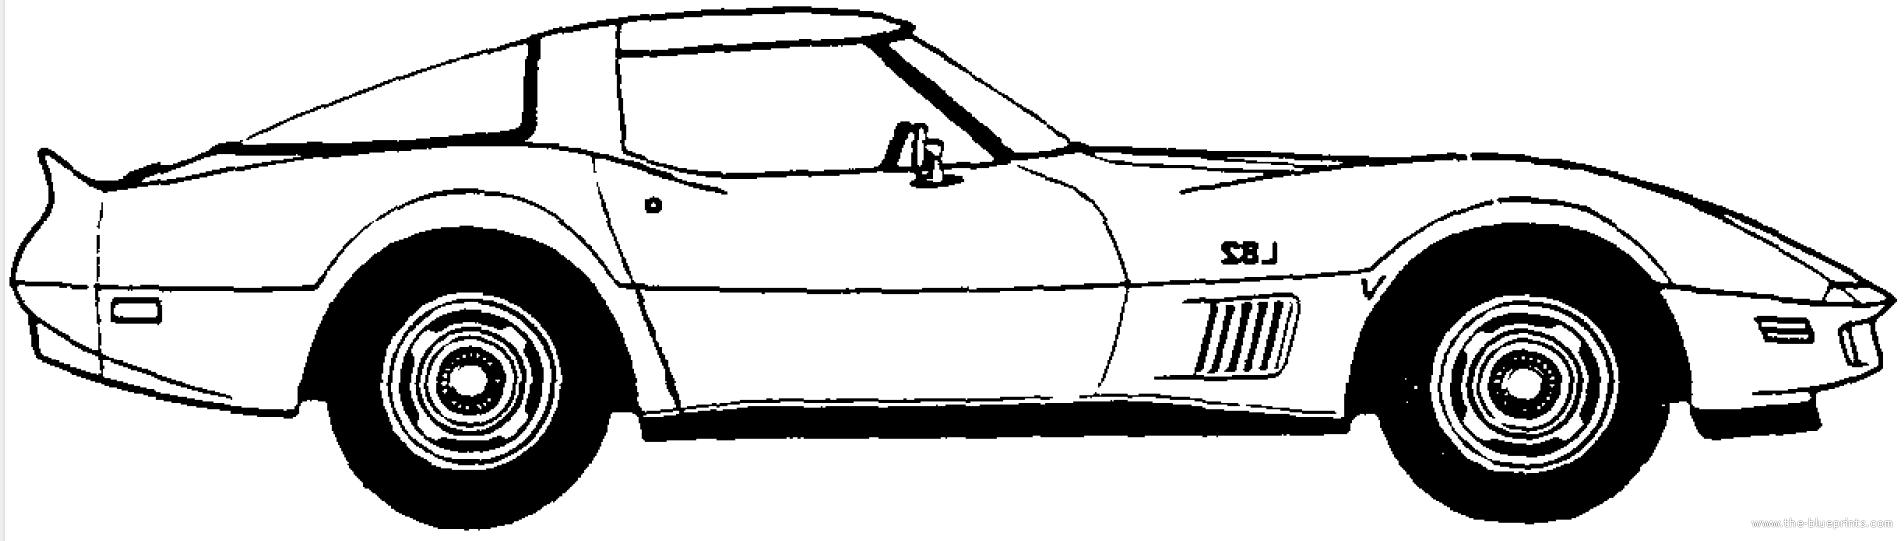 1980 Corvette Clipart #1